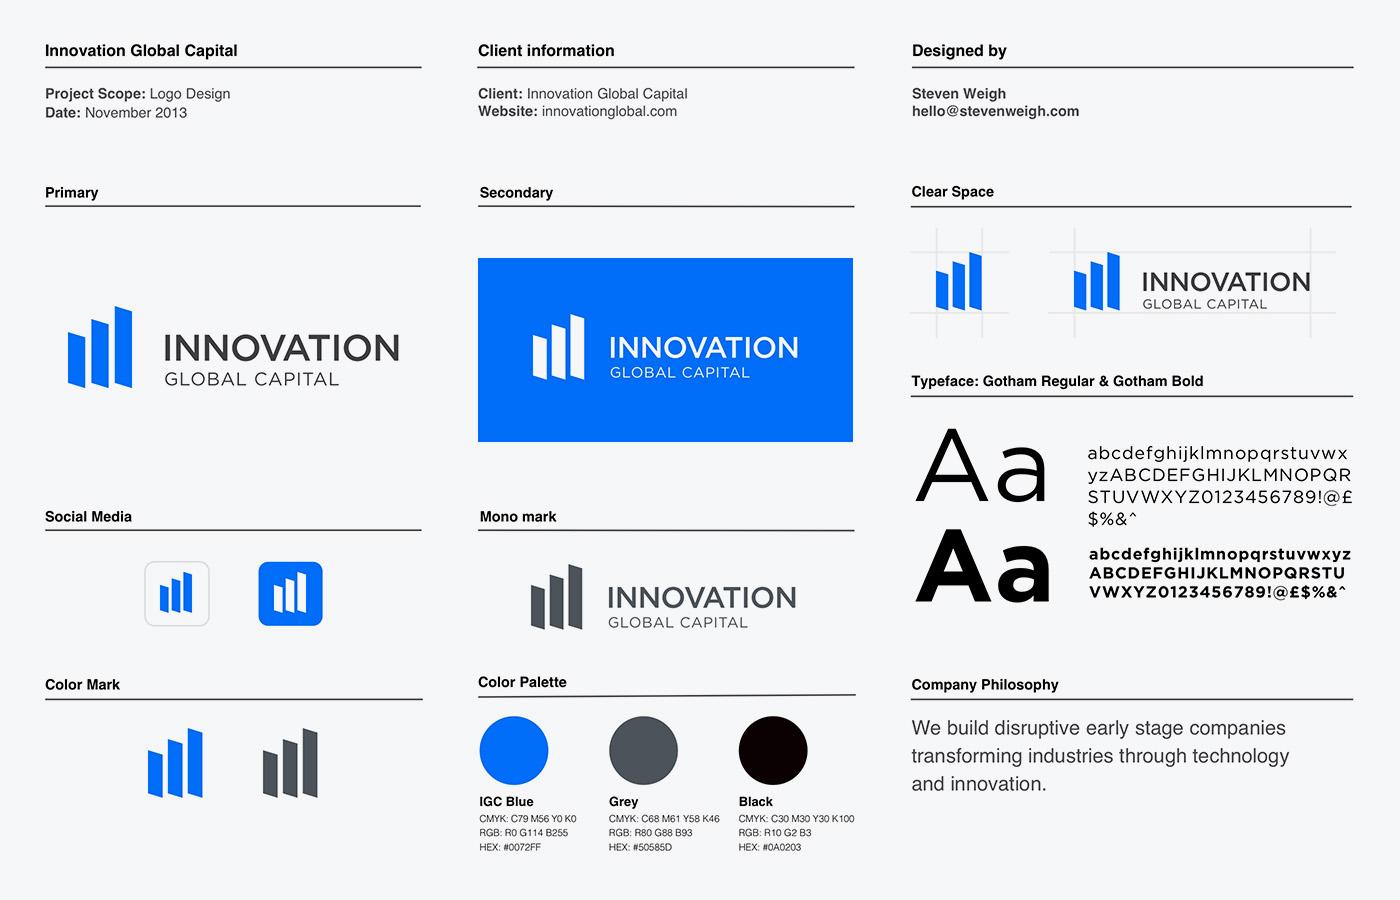 Basic Innovation Global style guide